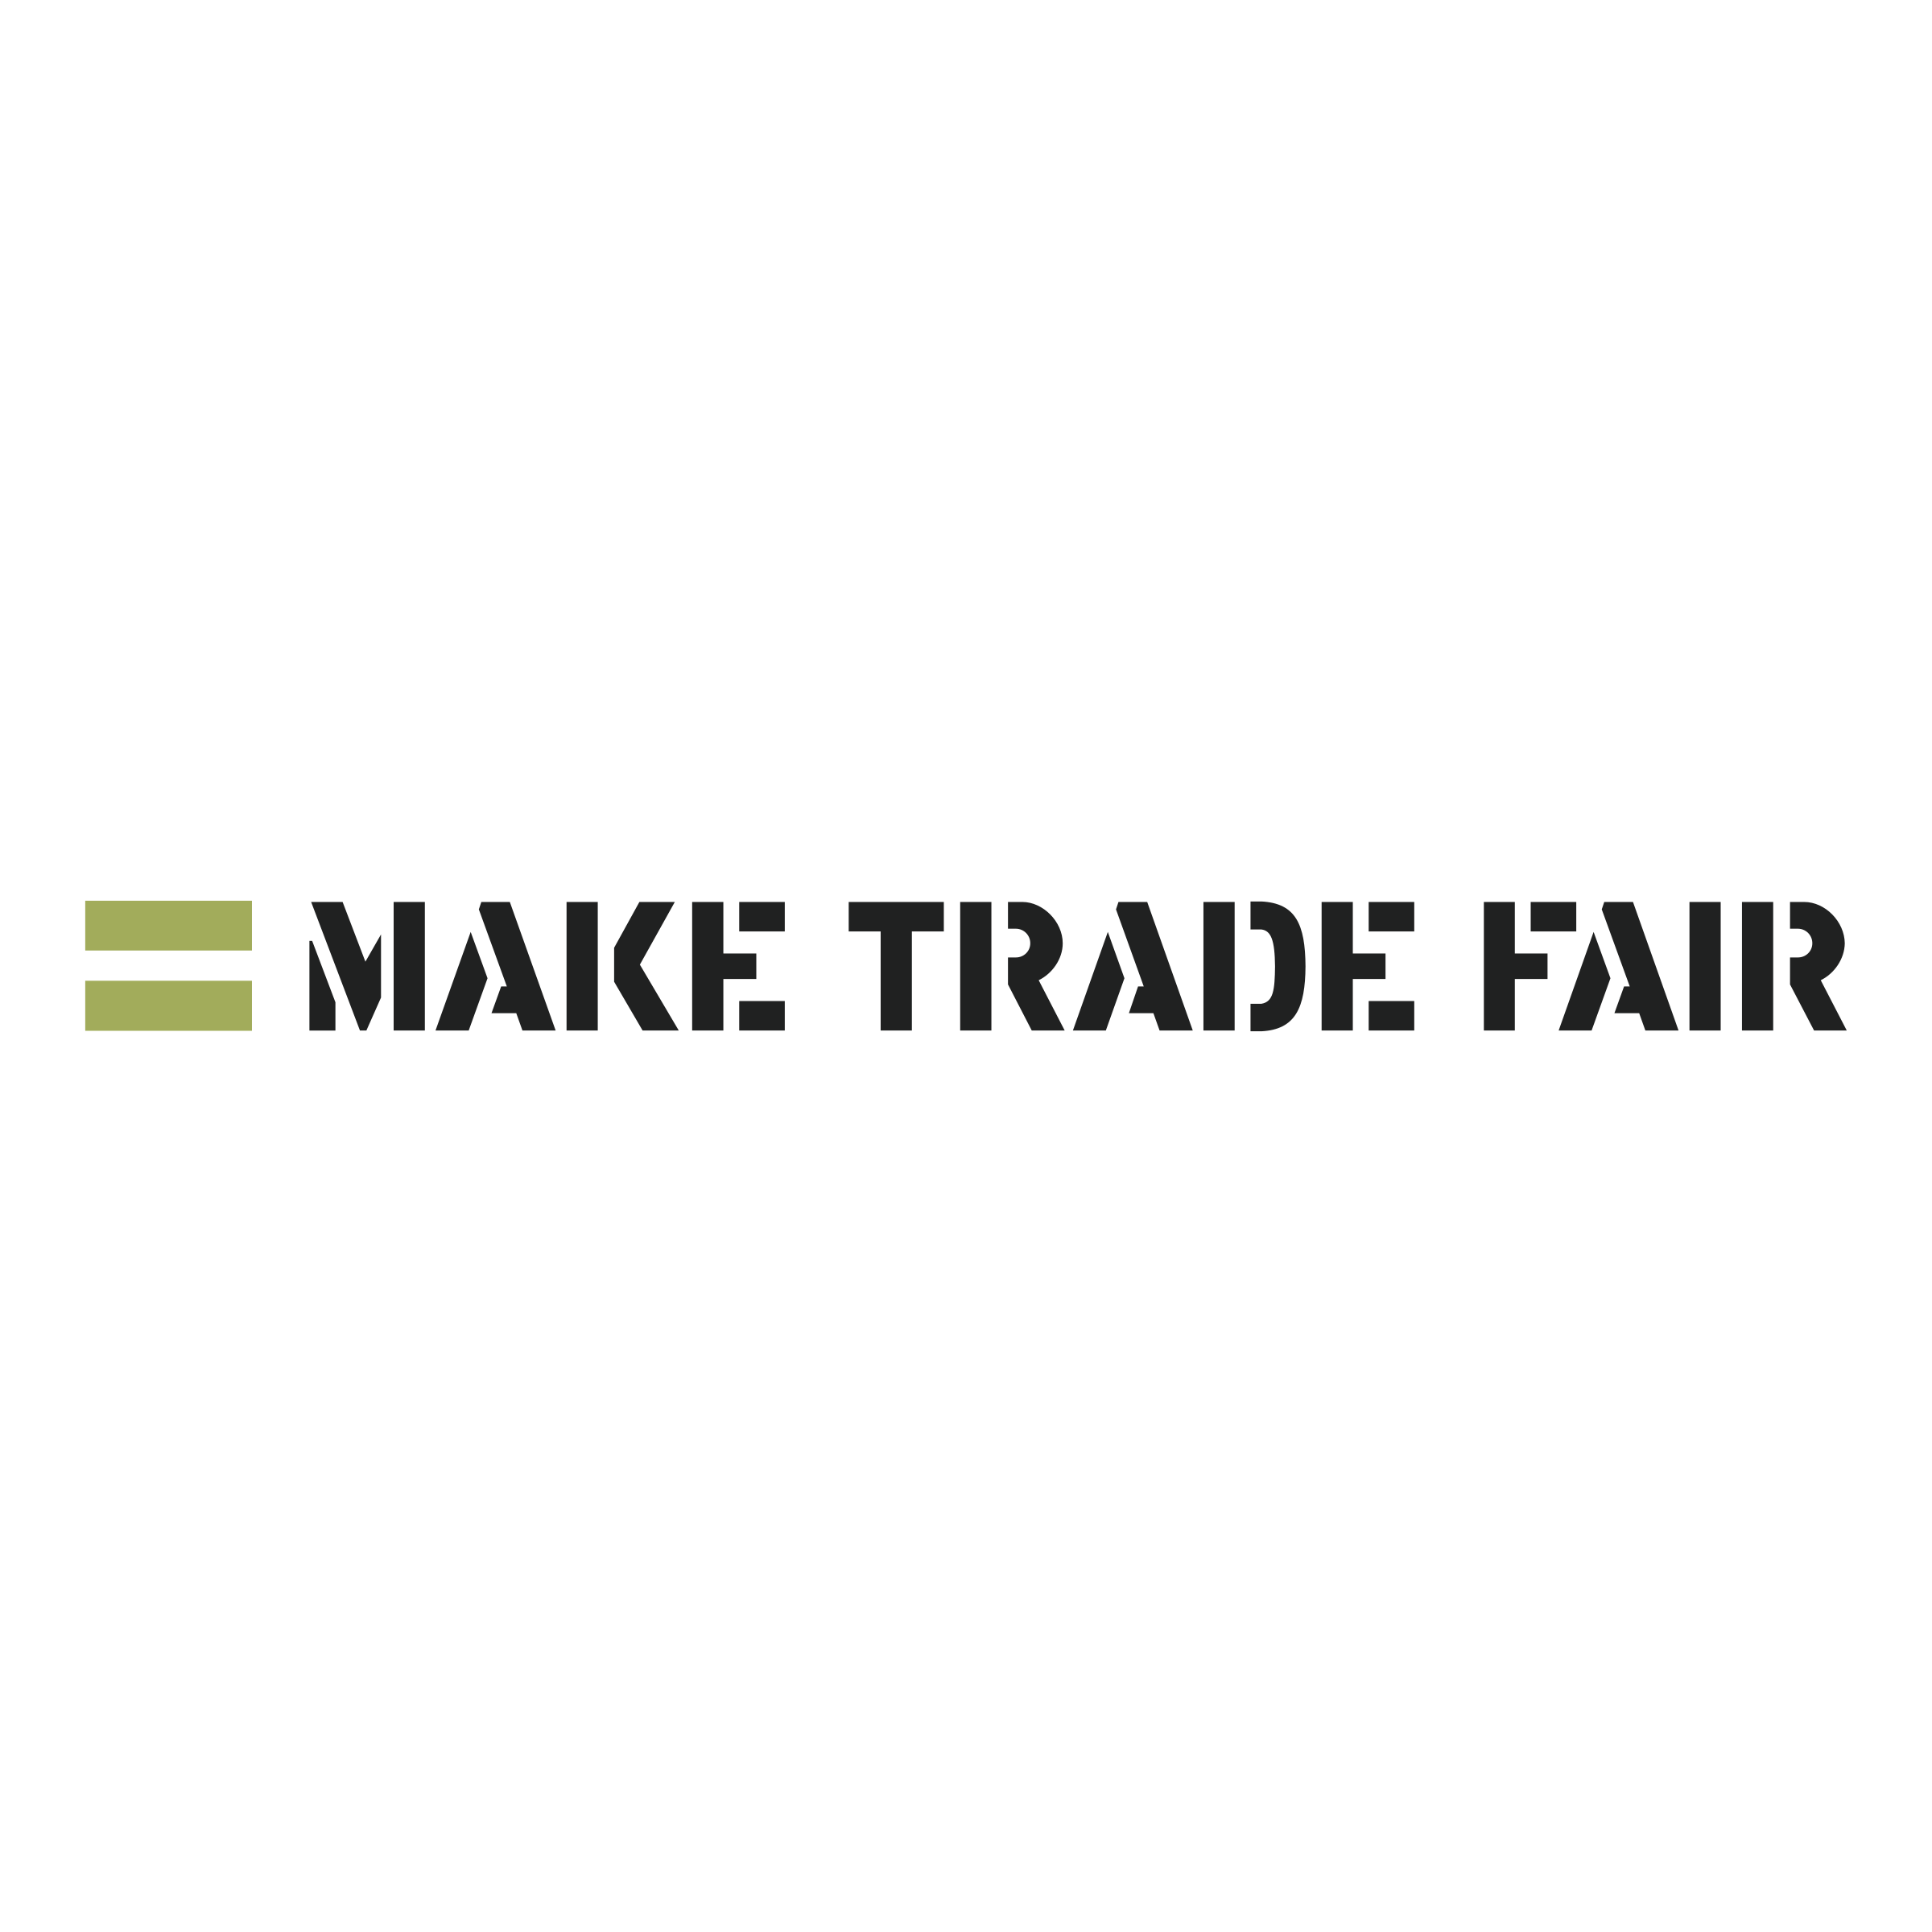 Make trade fair Logo Black And White - Fair PNG Black And White